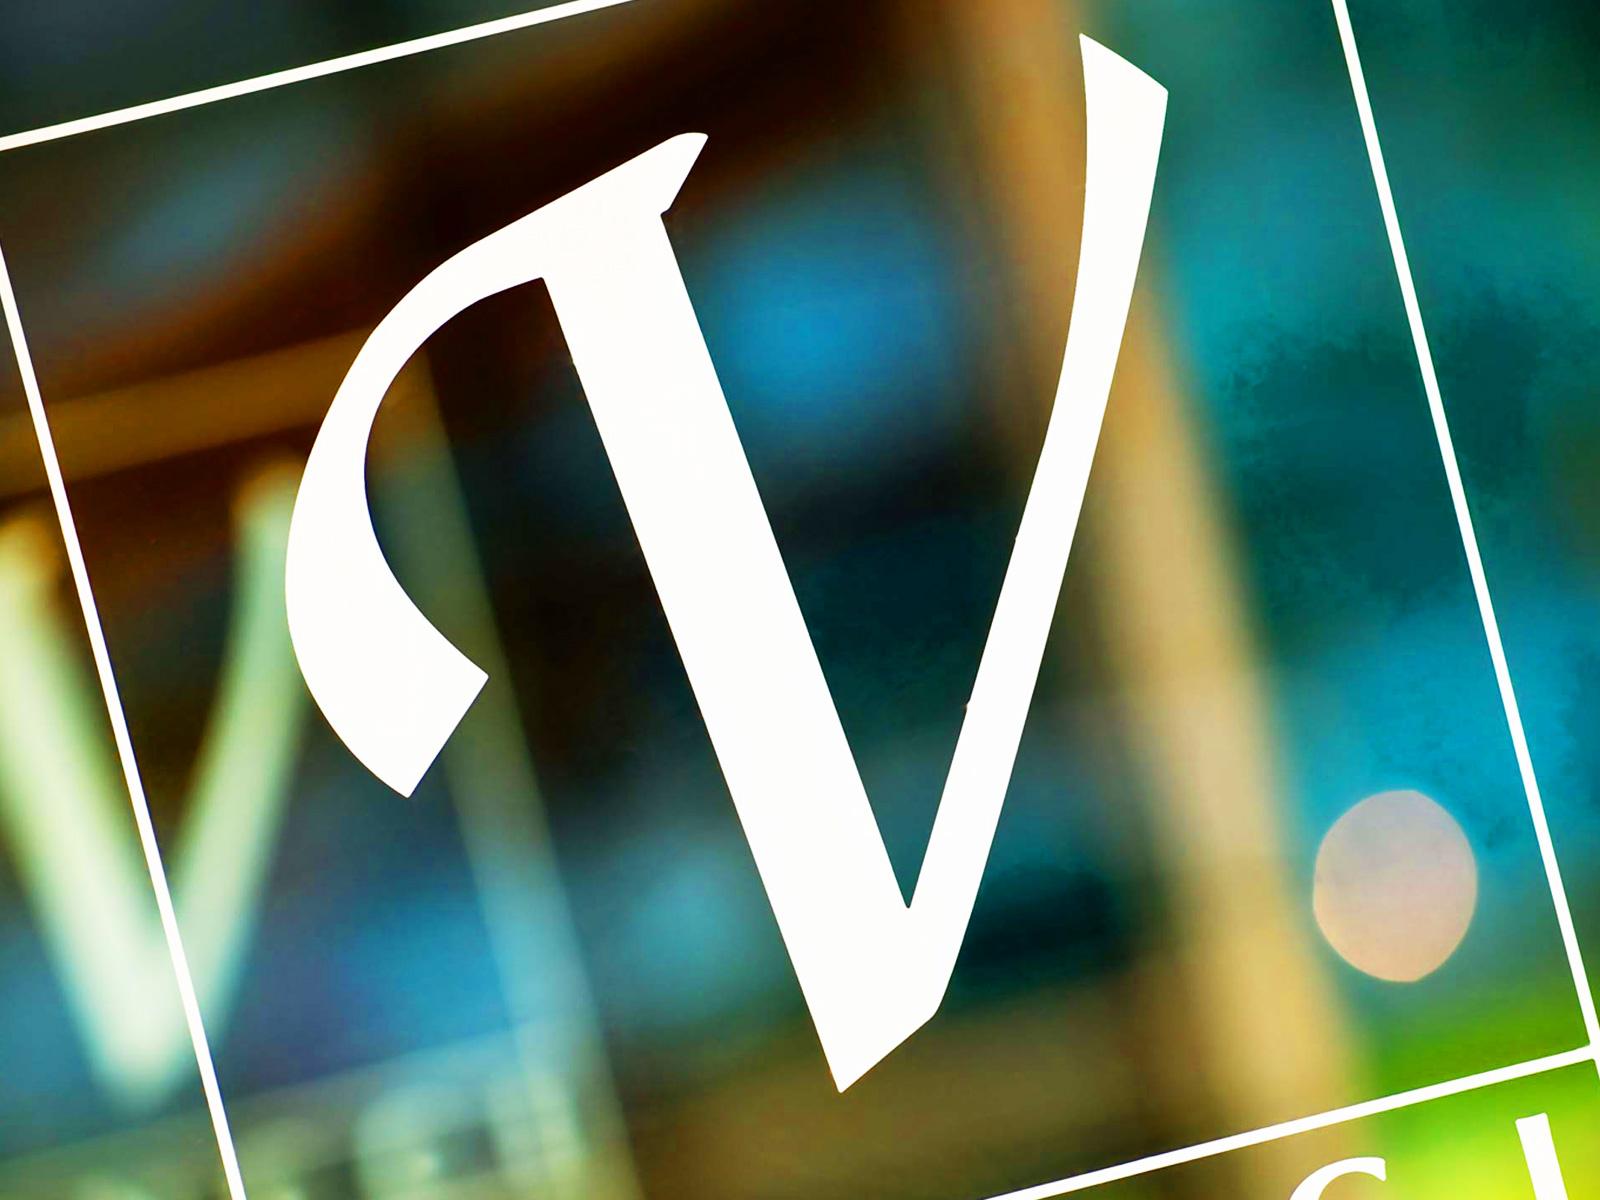 Acerca de Vincci - Vincci Hoteles